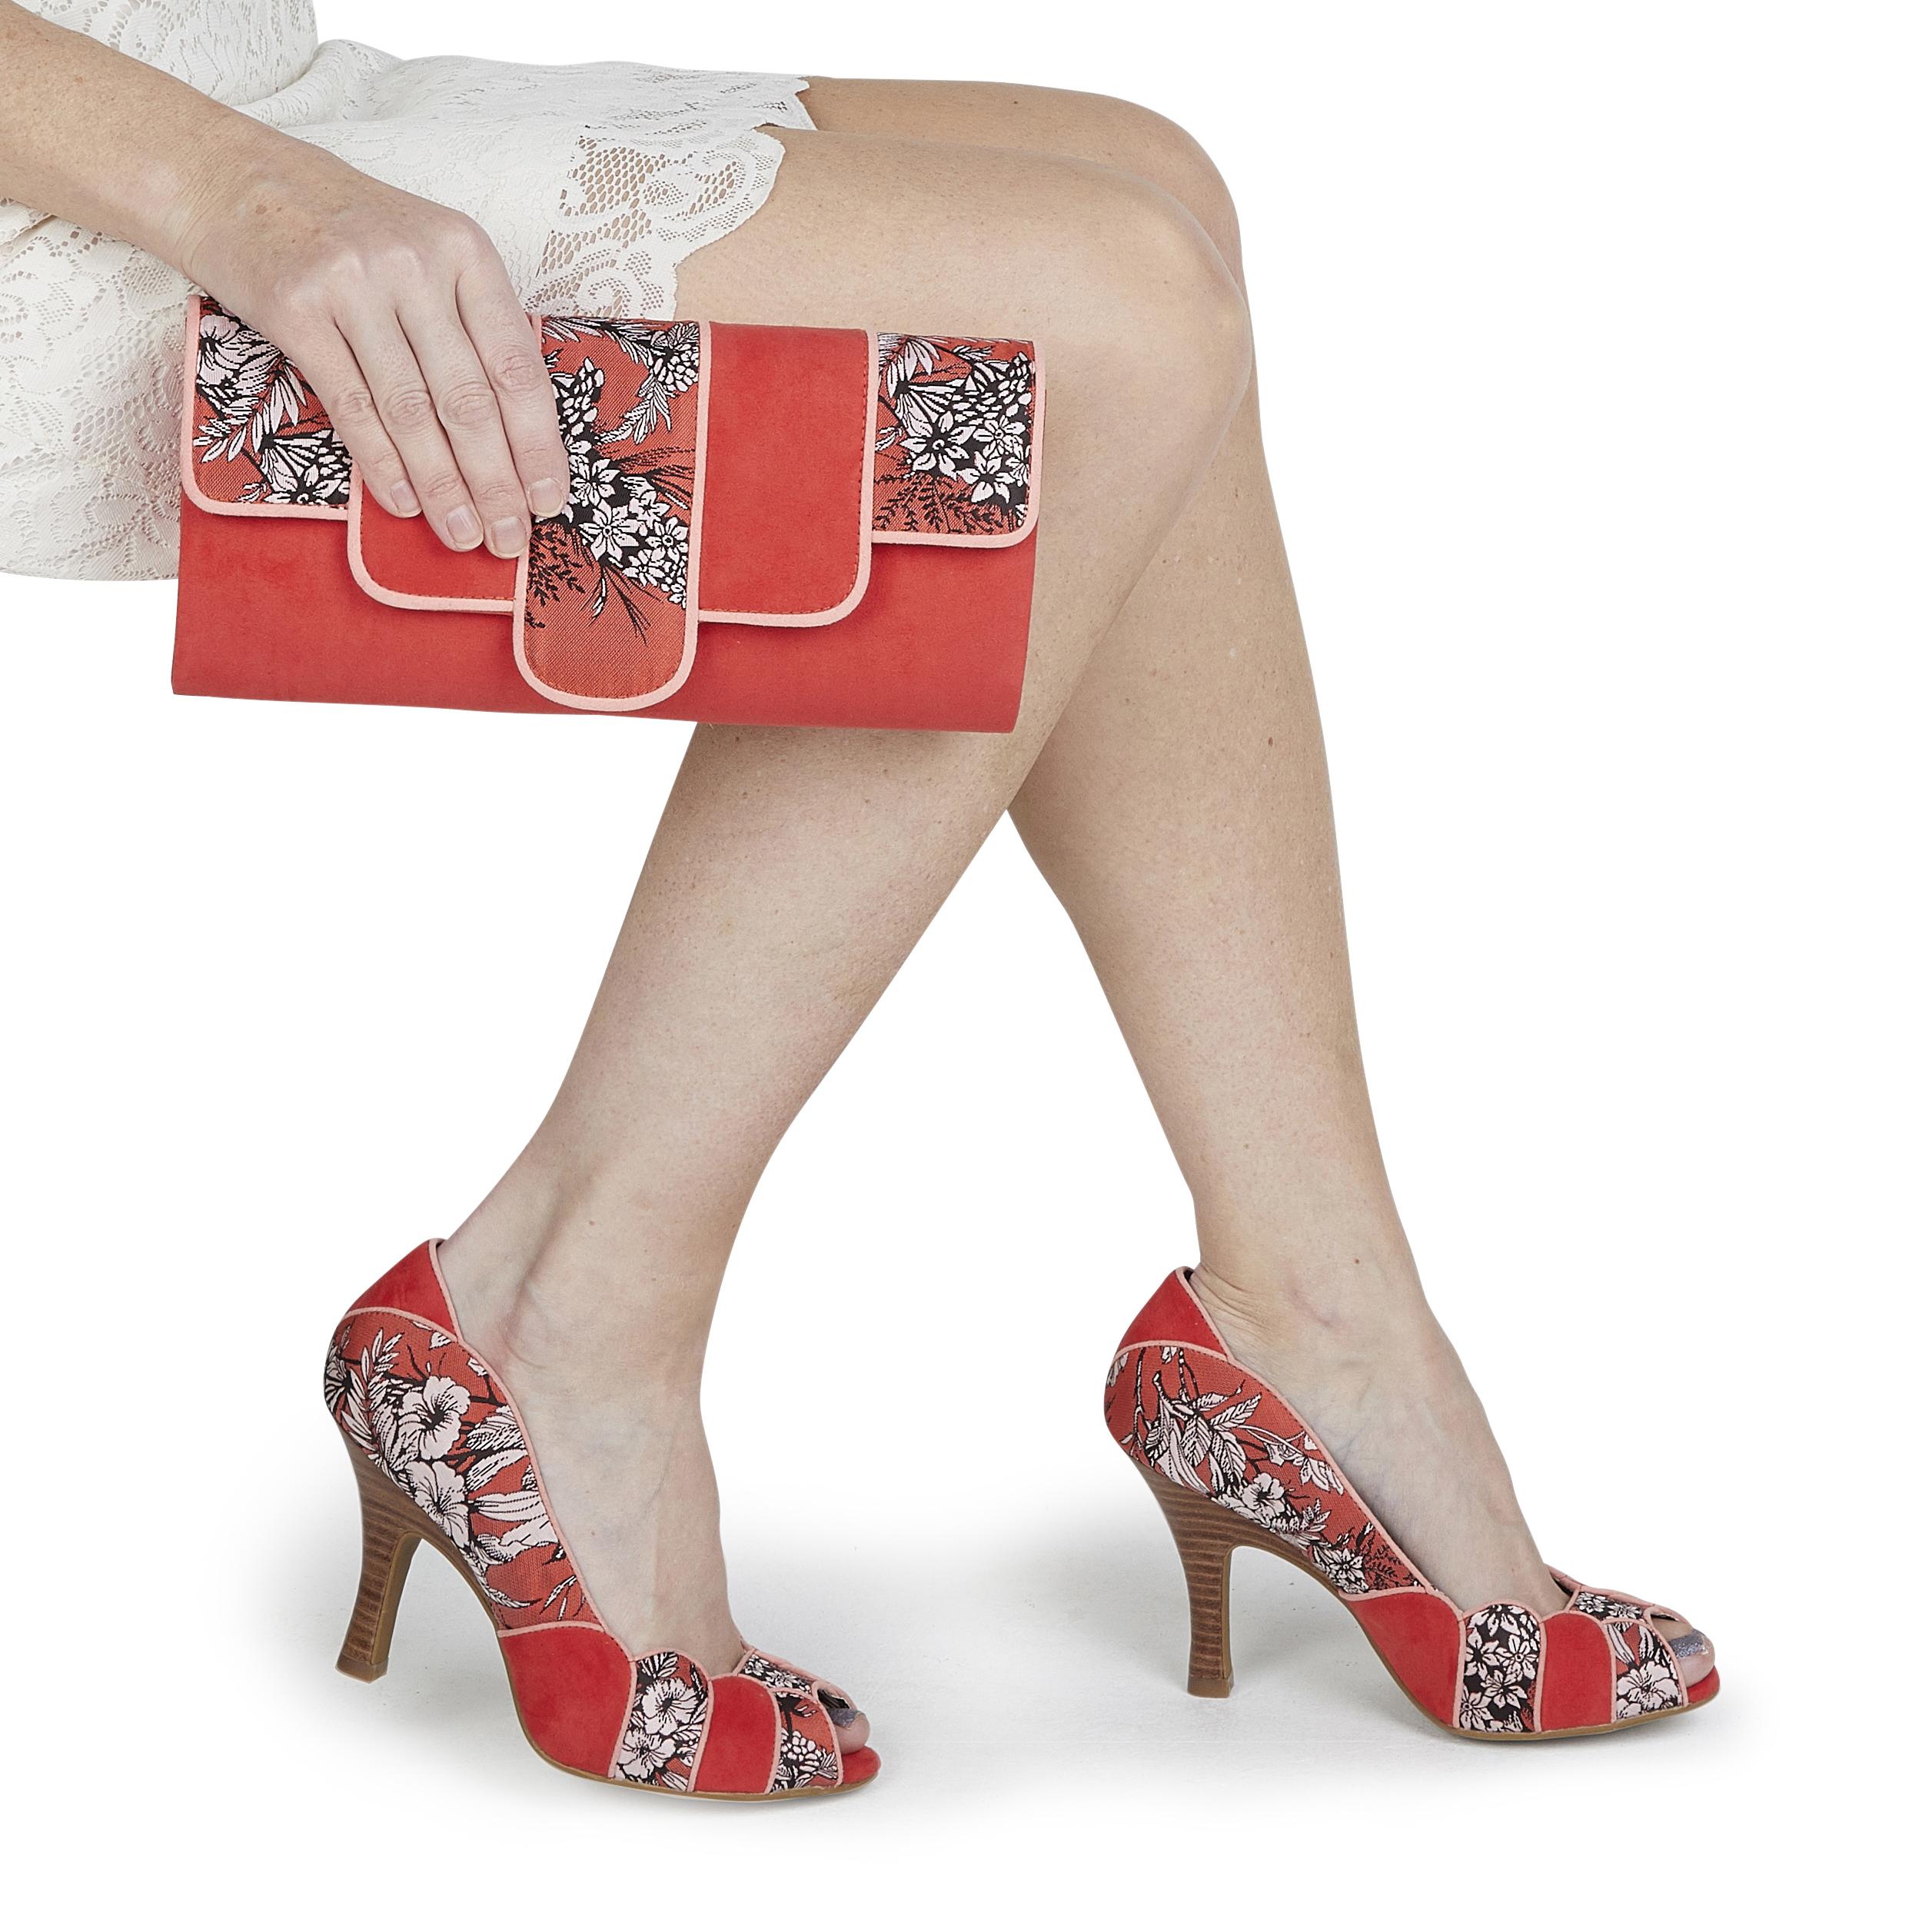 aa5c0f416b1b6 Ruby Shoo Canberra Art Deco Clutch Bag Chain Strap Matches Matilda ...